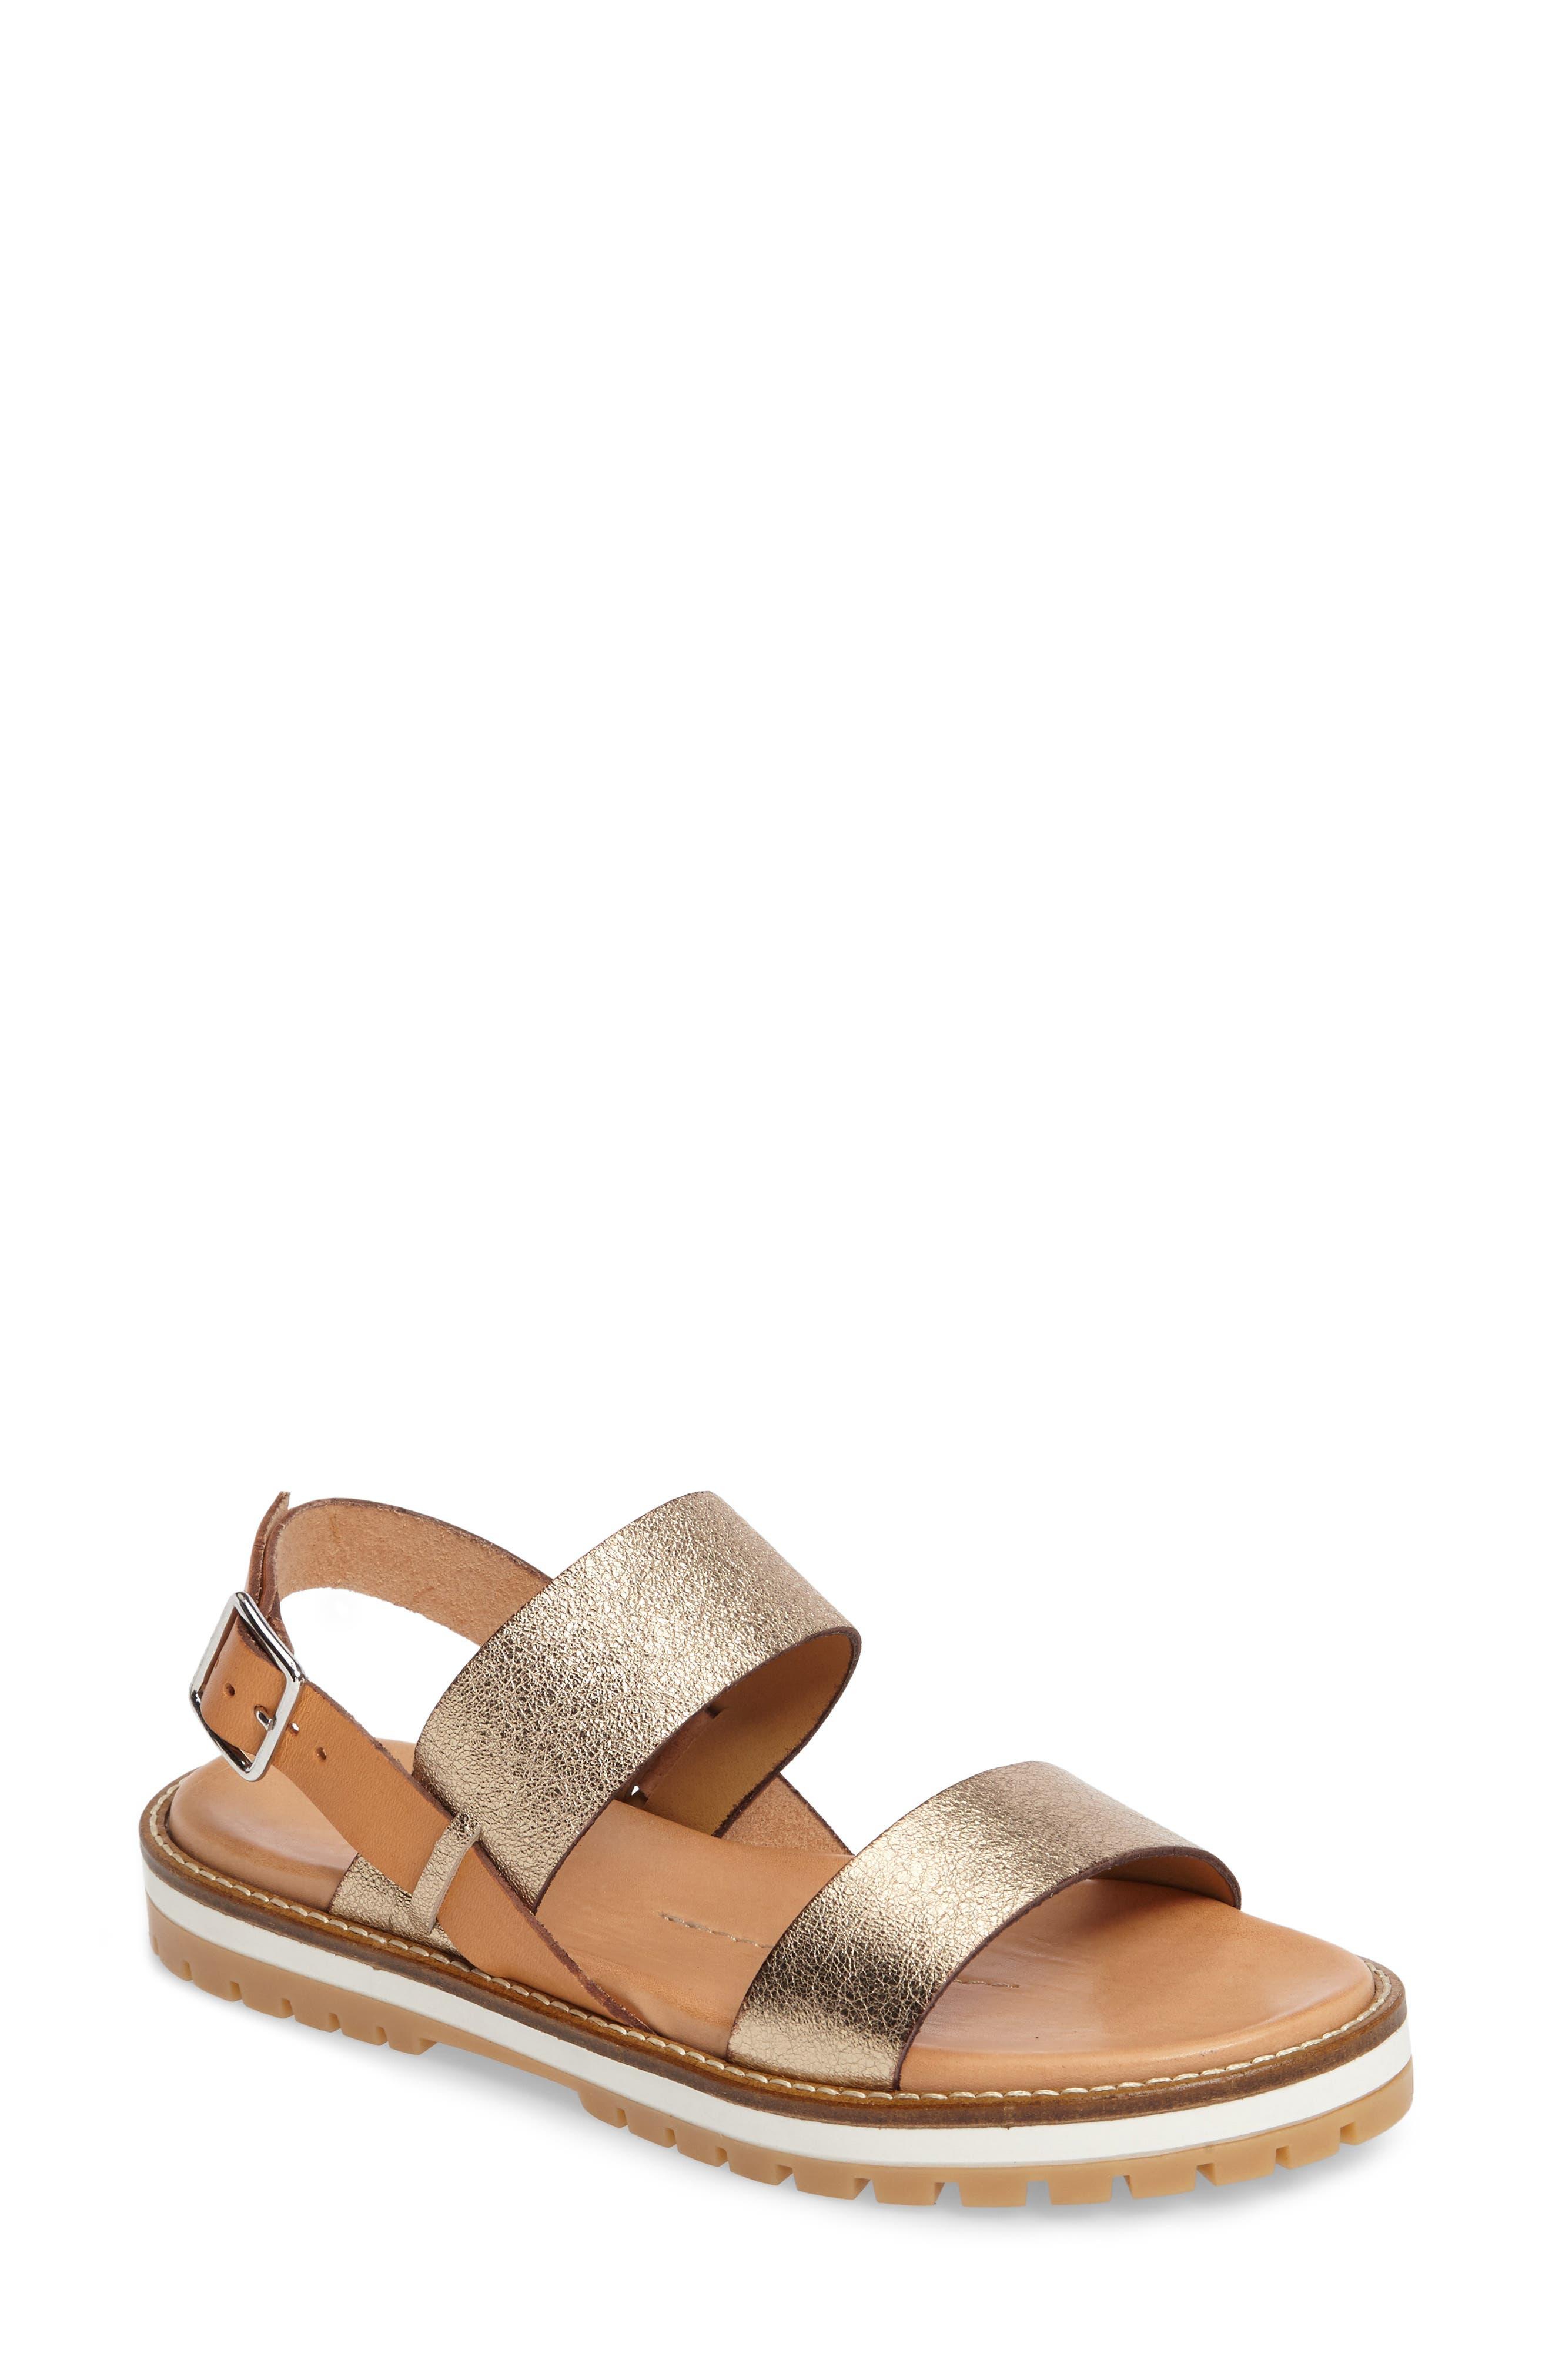 Rudsak Brenna Metallic Sandal (Women)